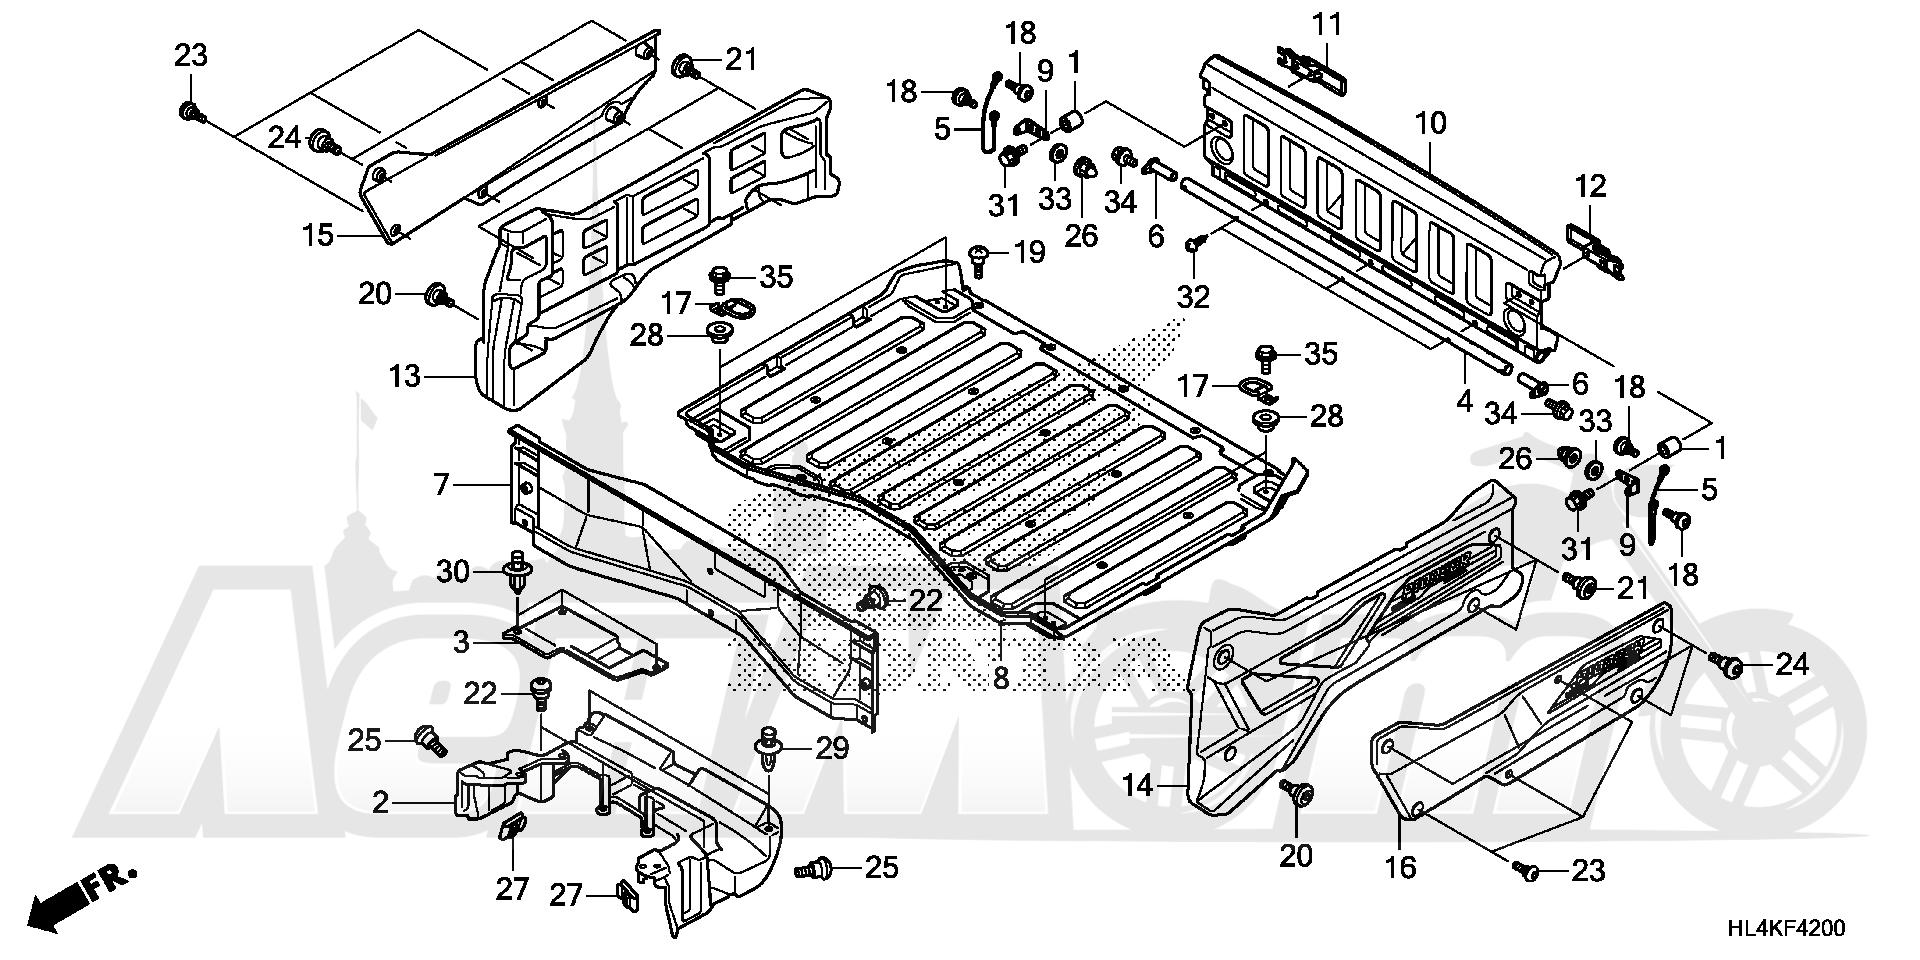 Запчасти для Квадроцикла Honda 2019 SXS1000M5P Раздел: BED PLATE AND REAR GATE (1) | BED пластина и зад GATE (1)